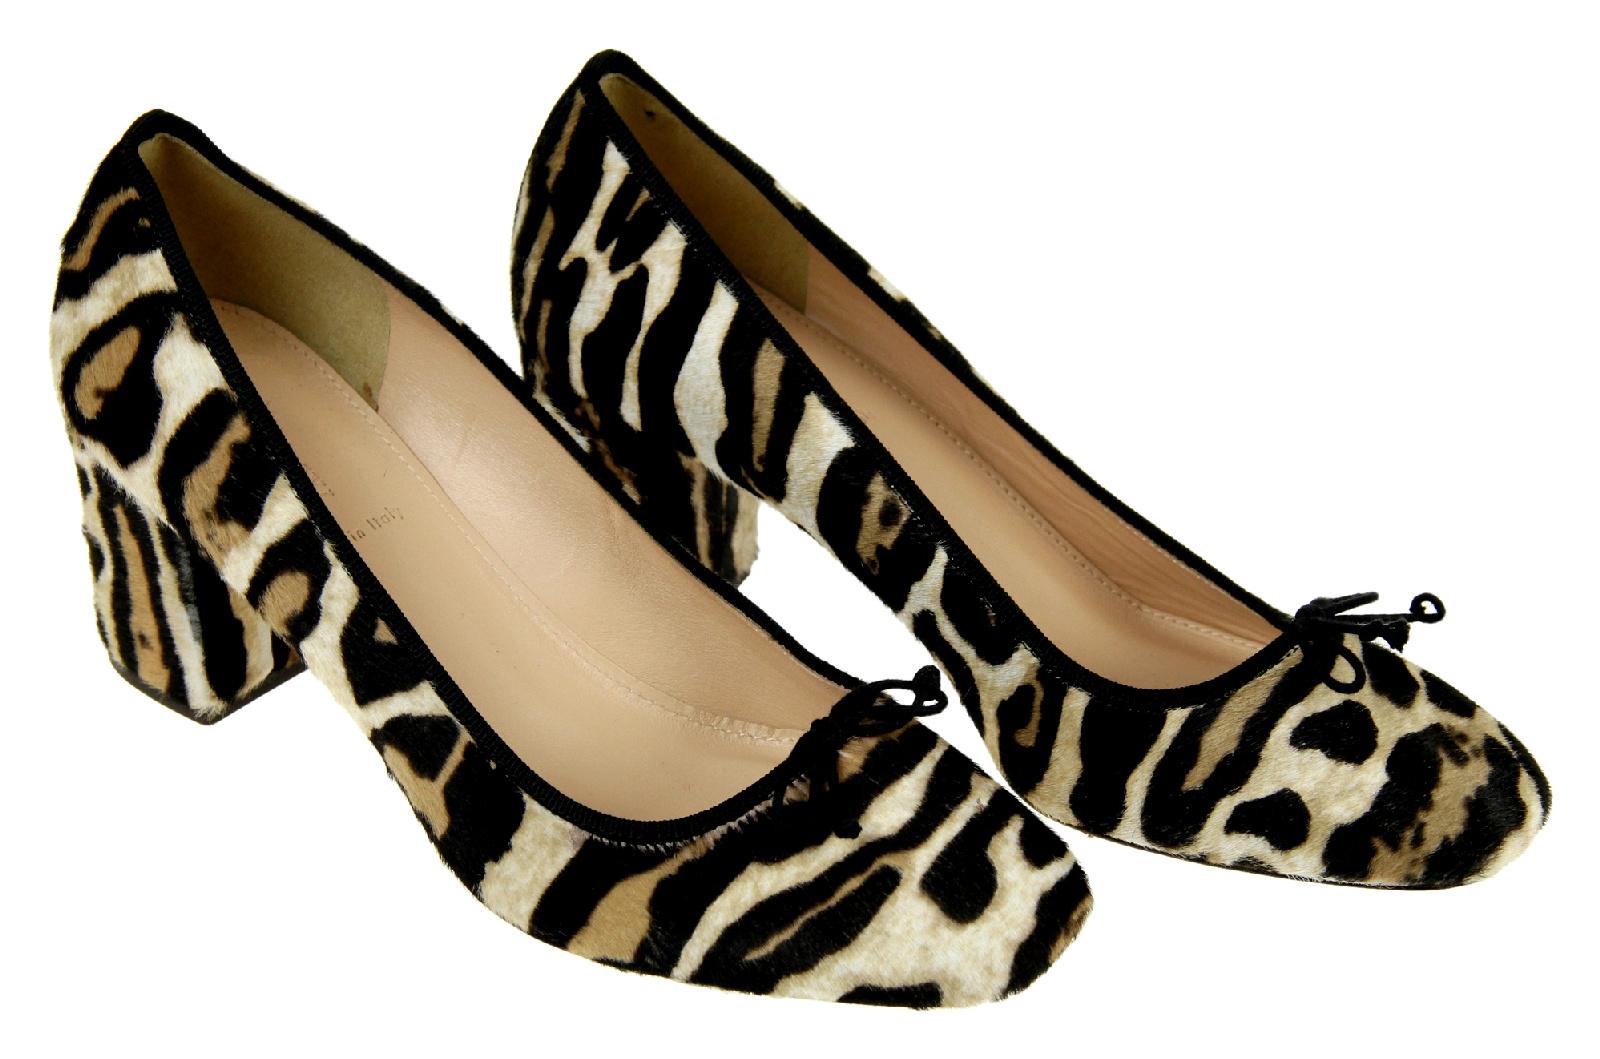 75a556eea71b Details about J Crew Sophia Pumps Heels Shoes Calf Hair 6.5 Tan Black  Leopard Womens F7999